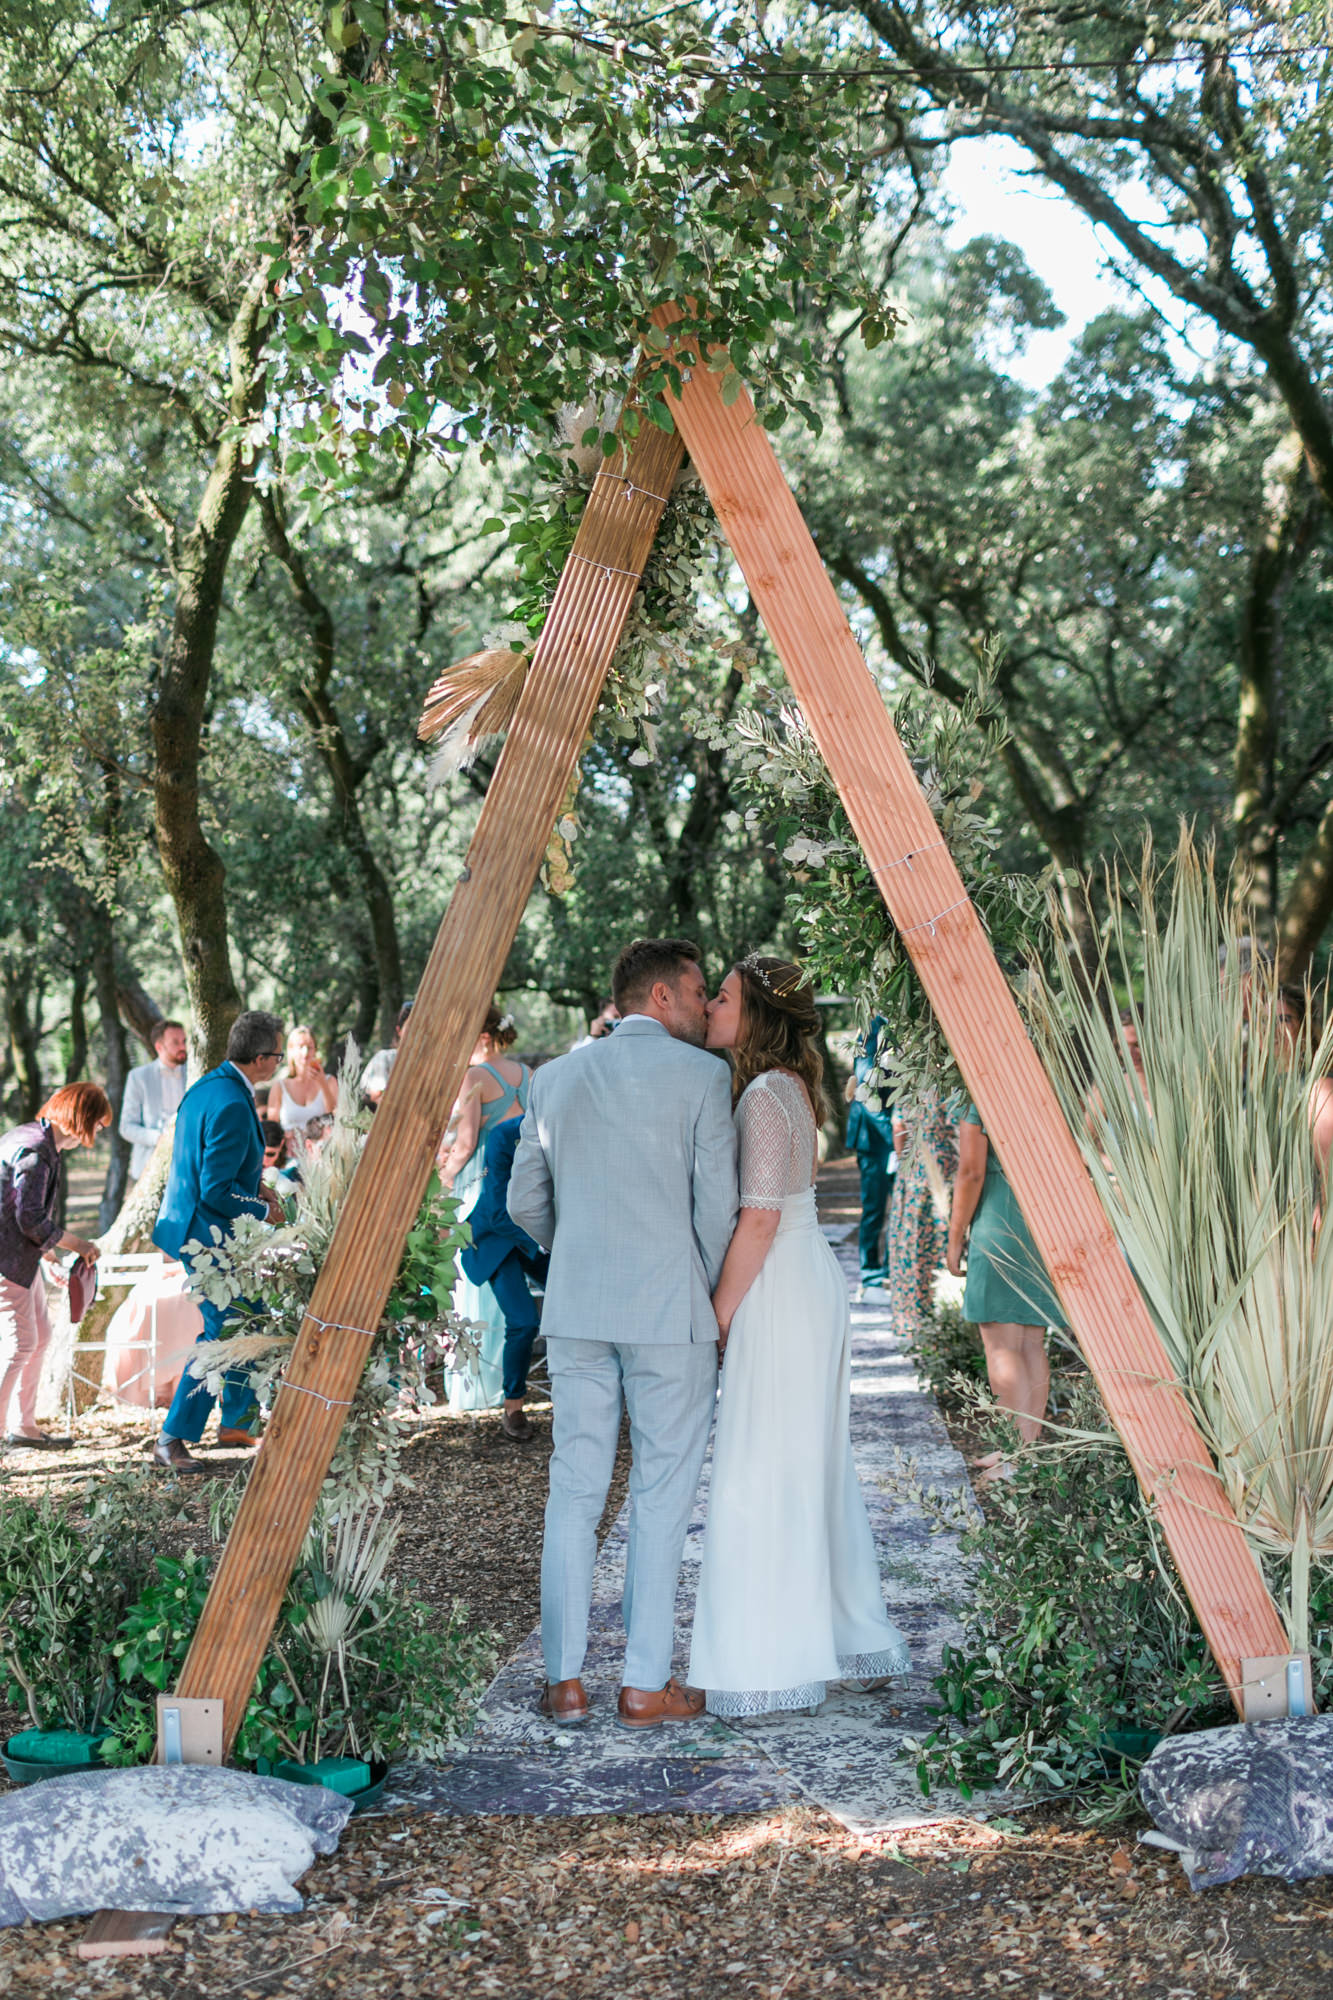 photographe-mariage-aix-en-provence-marseille